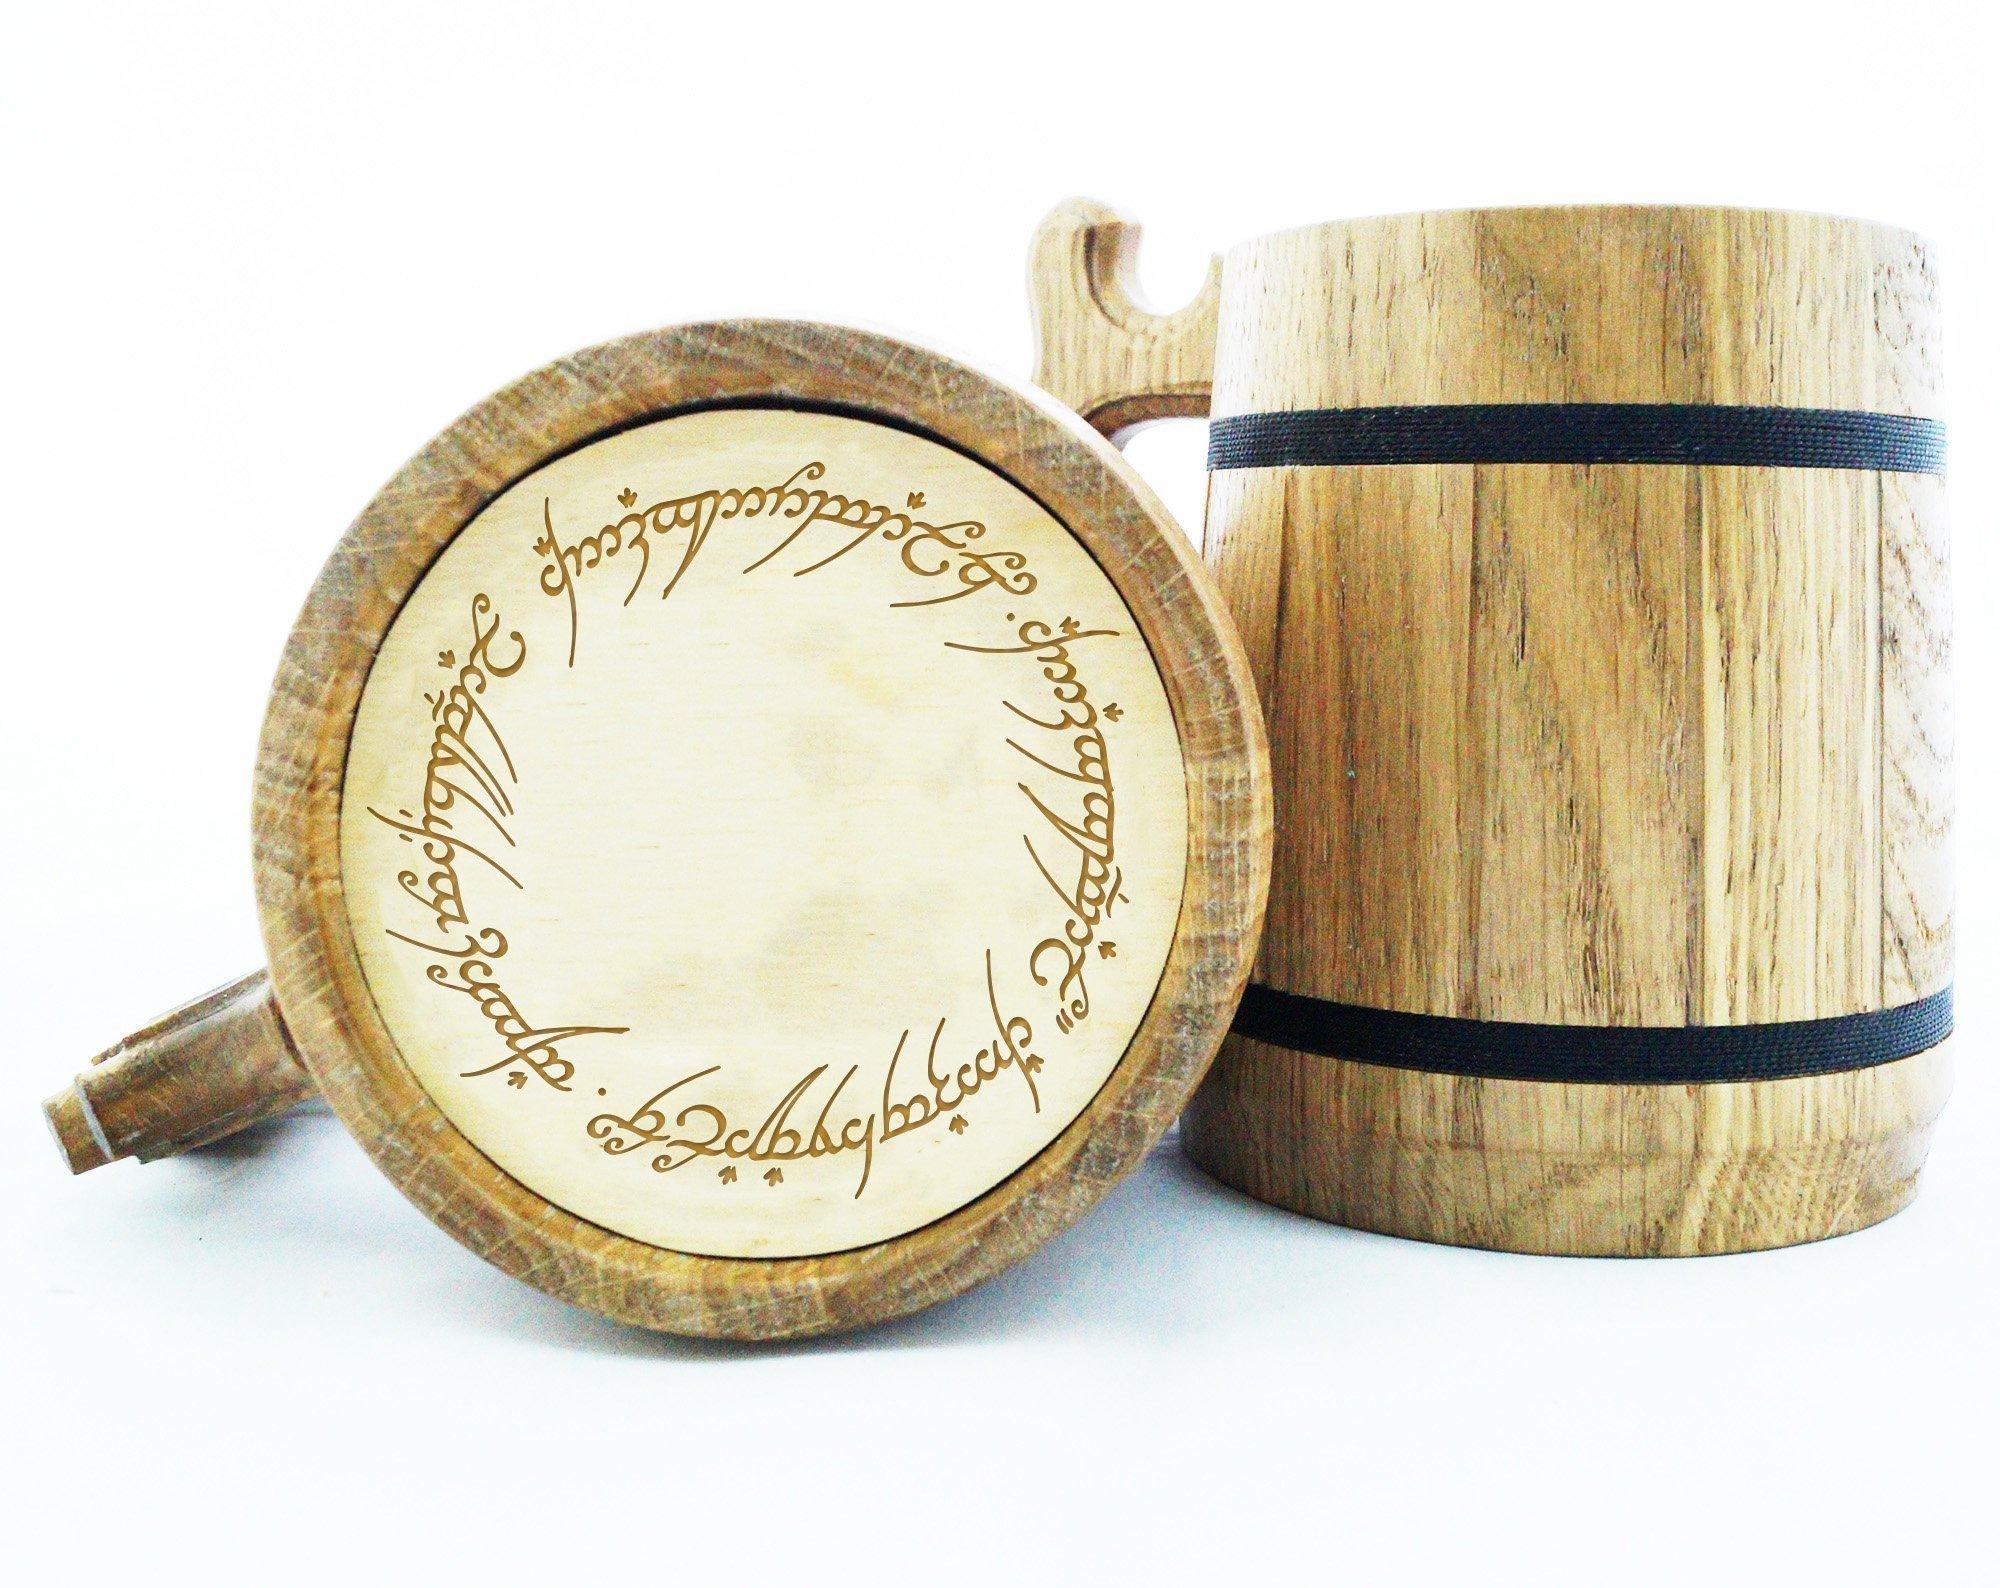 Lord Of The Rings Gifts / LOTR Mug / Lord Of The Rings Gift / Wood Beer Mug / Engraved Mug / Personal Gifts for Men / Beer Tankard K47